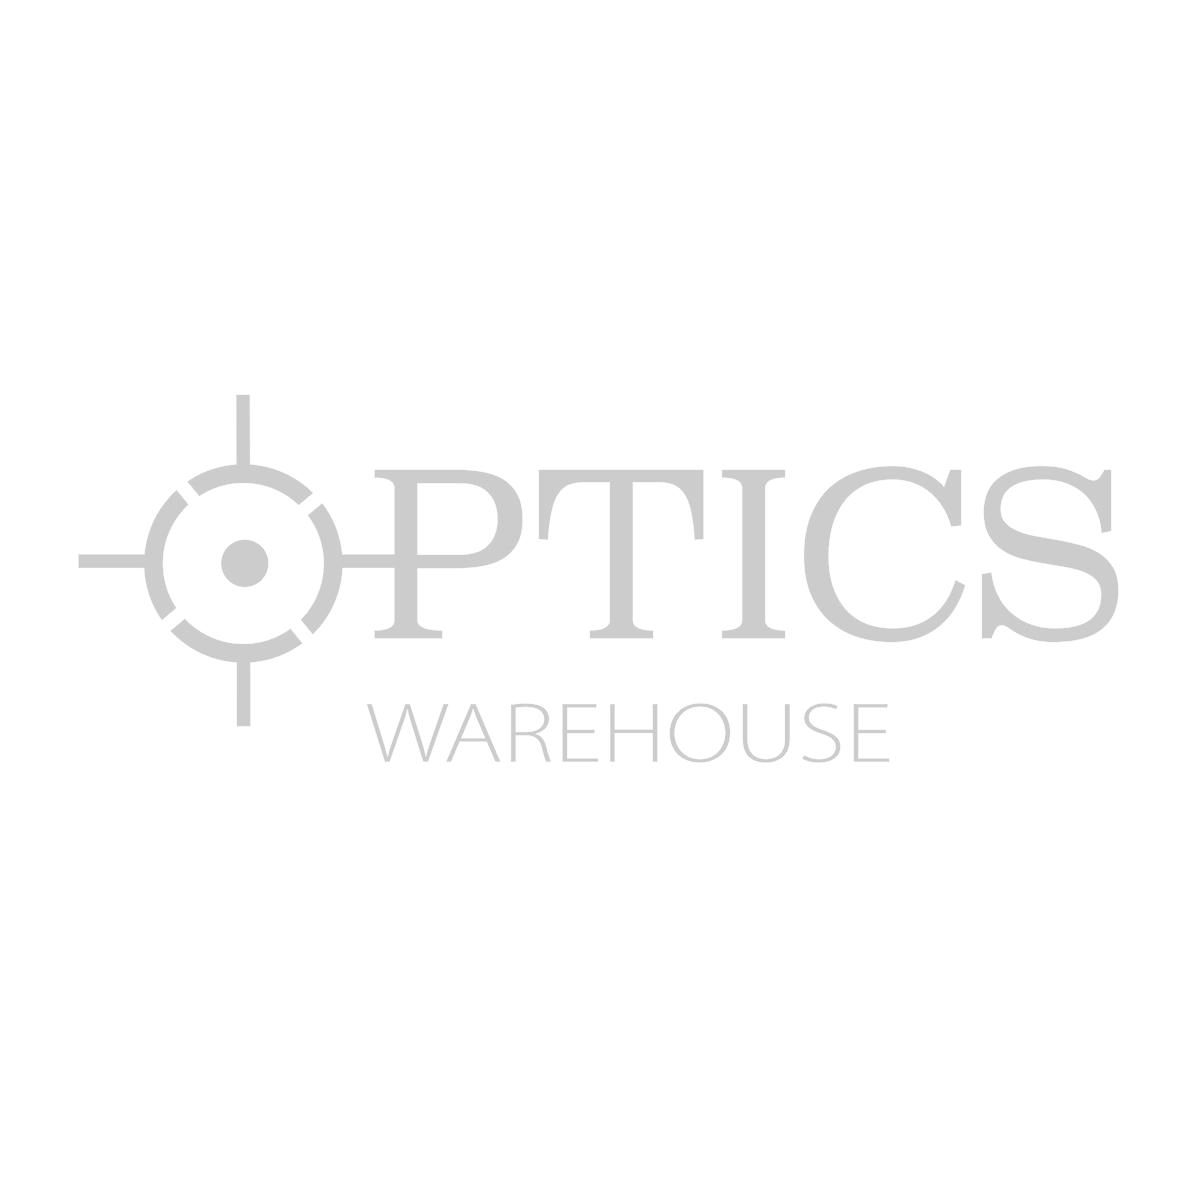 Nitesite Anti Glare Filters (2 pack)